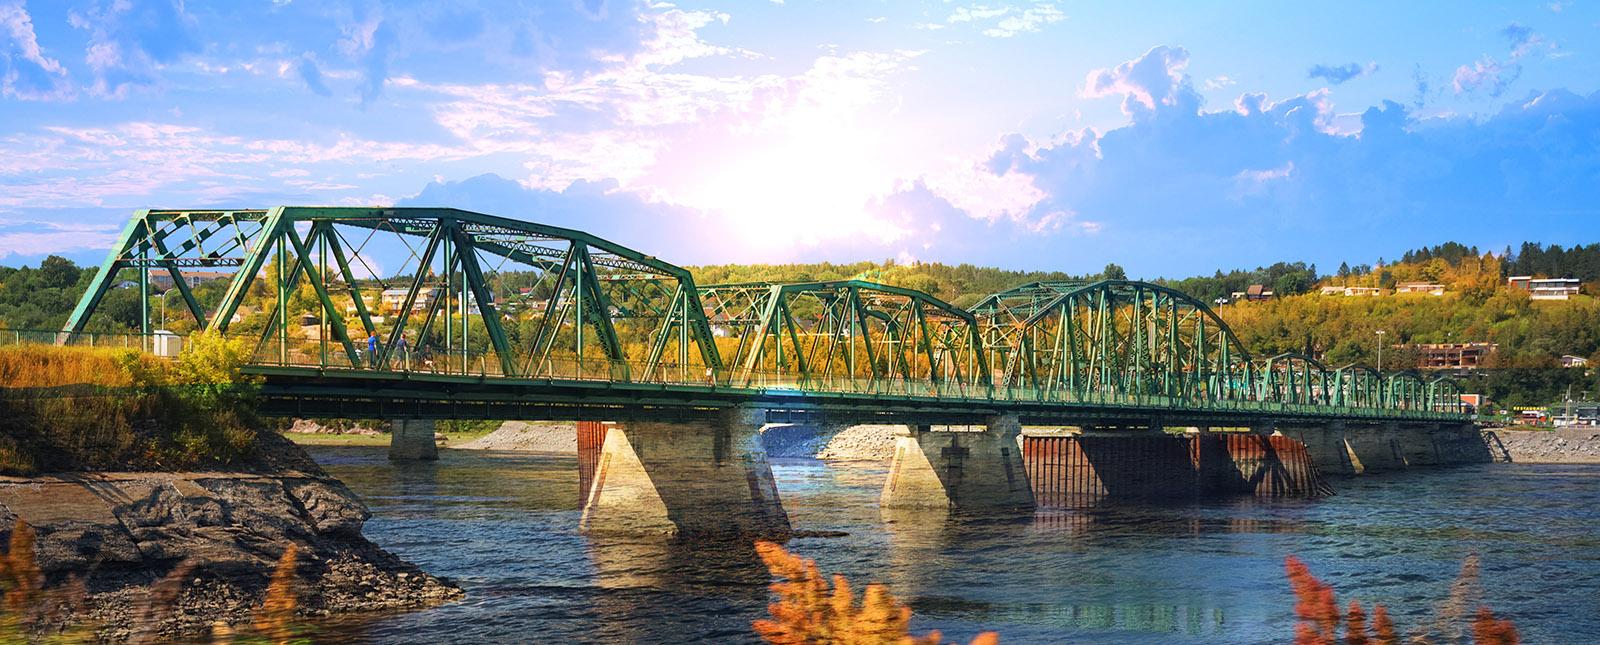 Old Saguenay Bridge and River - RF Stock Image